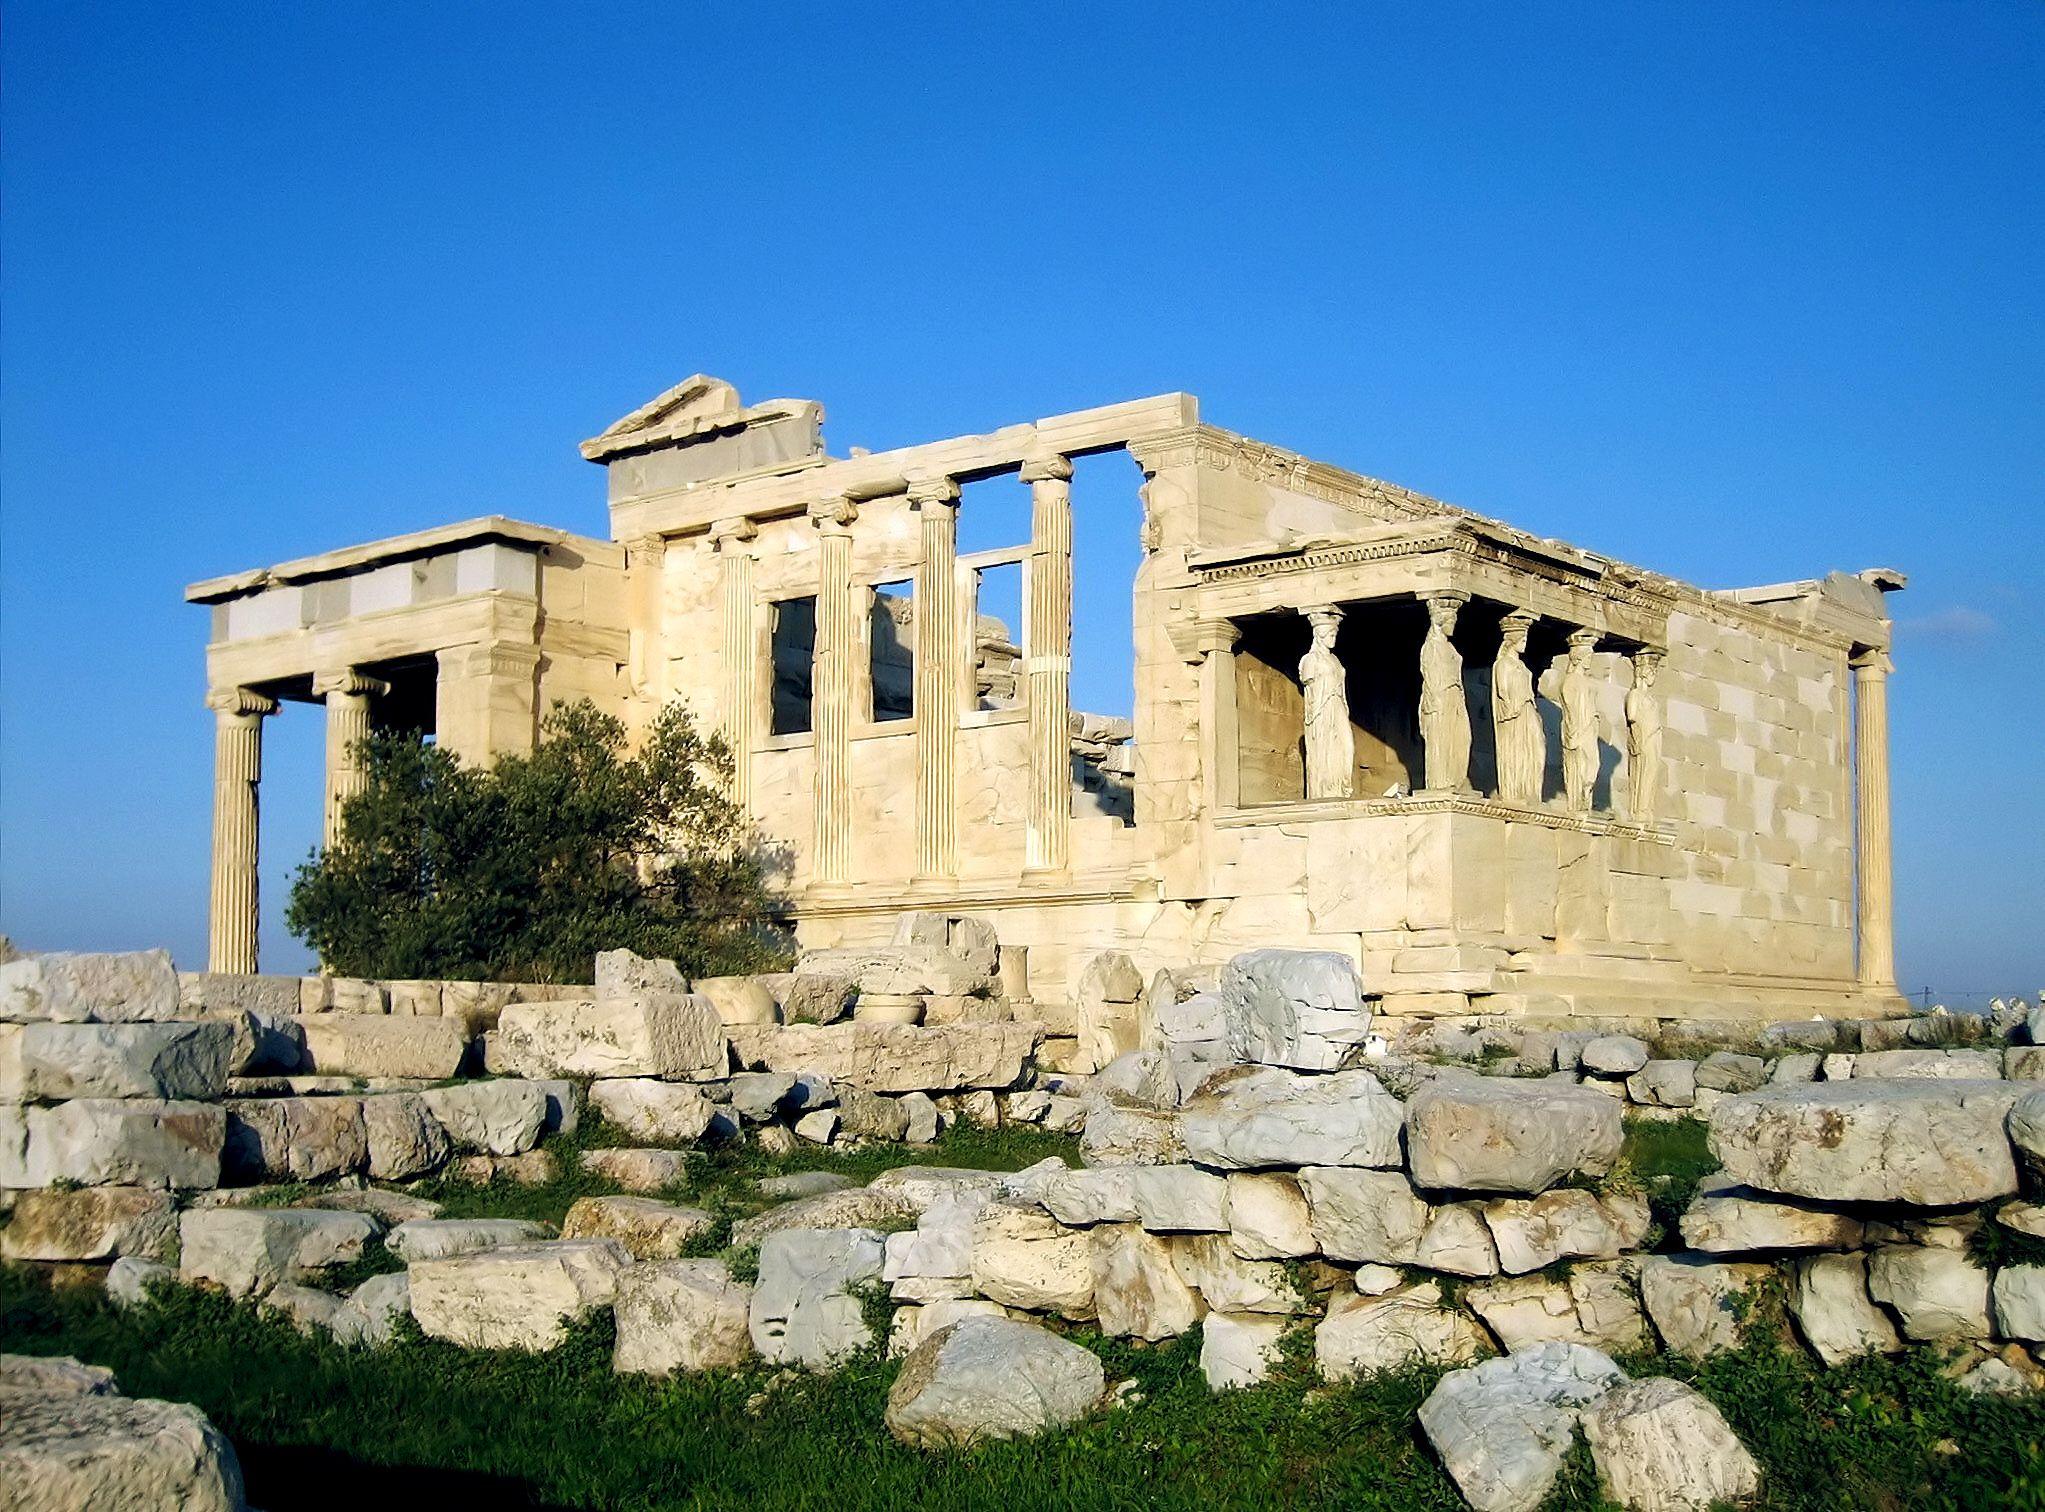 Erecteion Acrópolis de Atenas - Período Clásico - Antigua Grecia